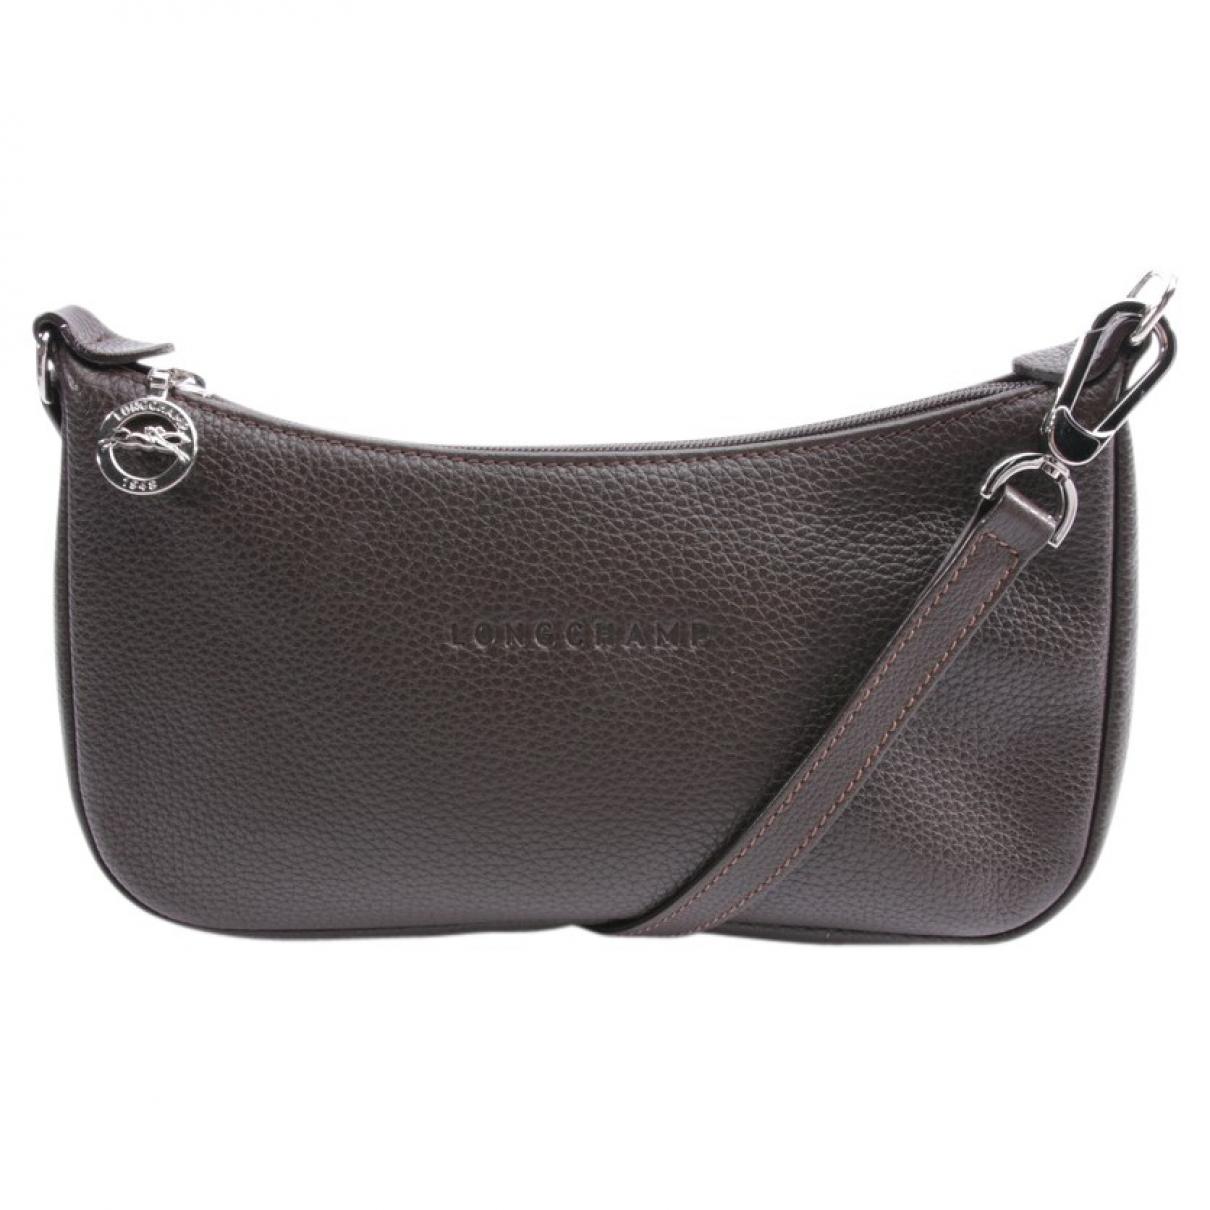 Longchamp \N Clutch in  Braun Leder